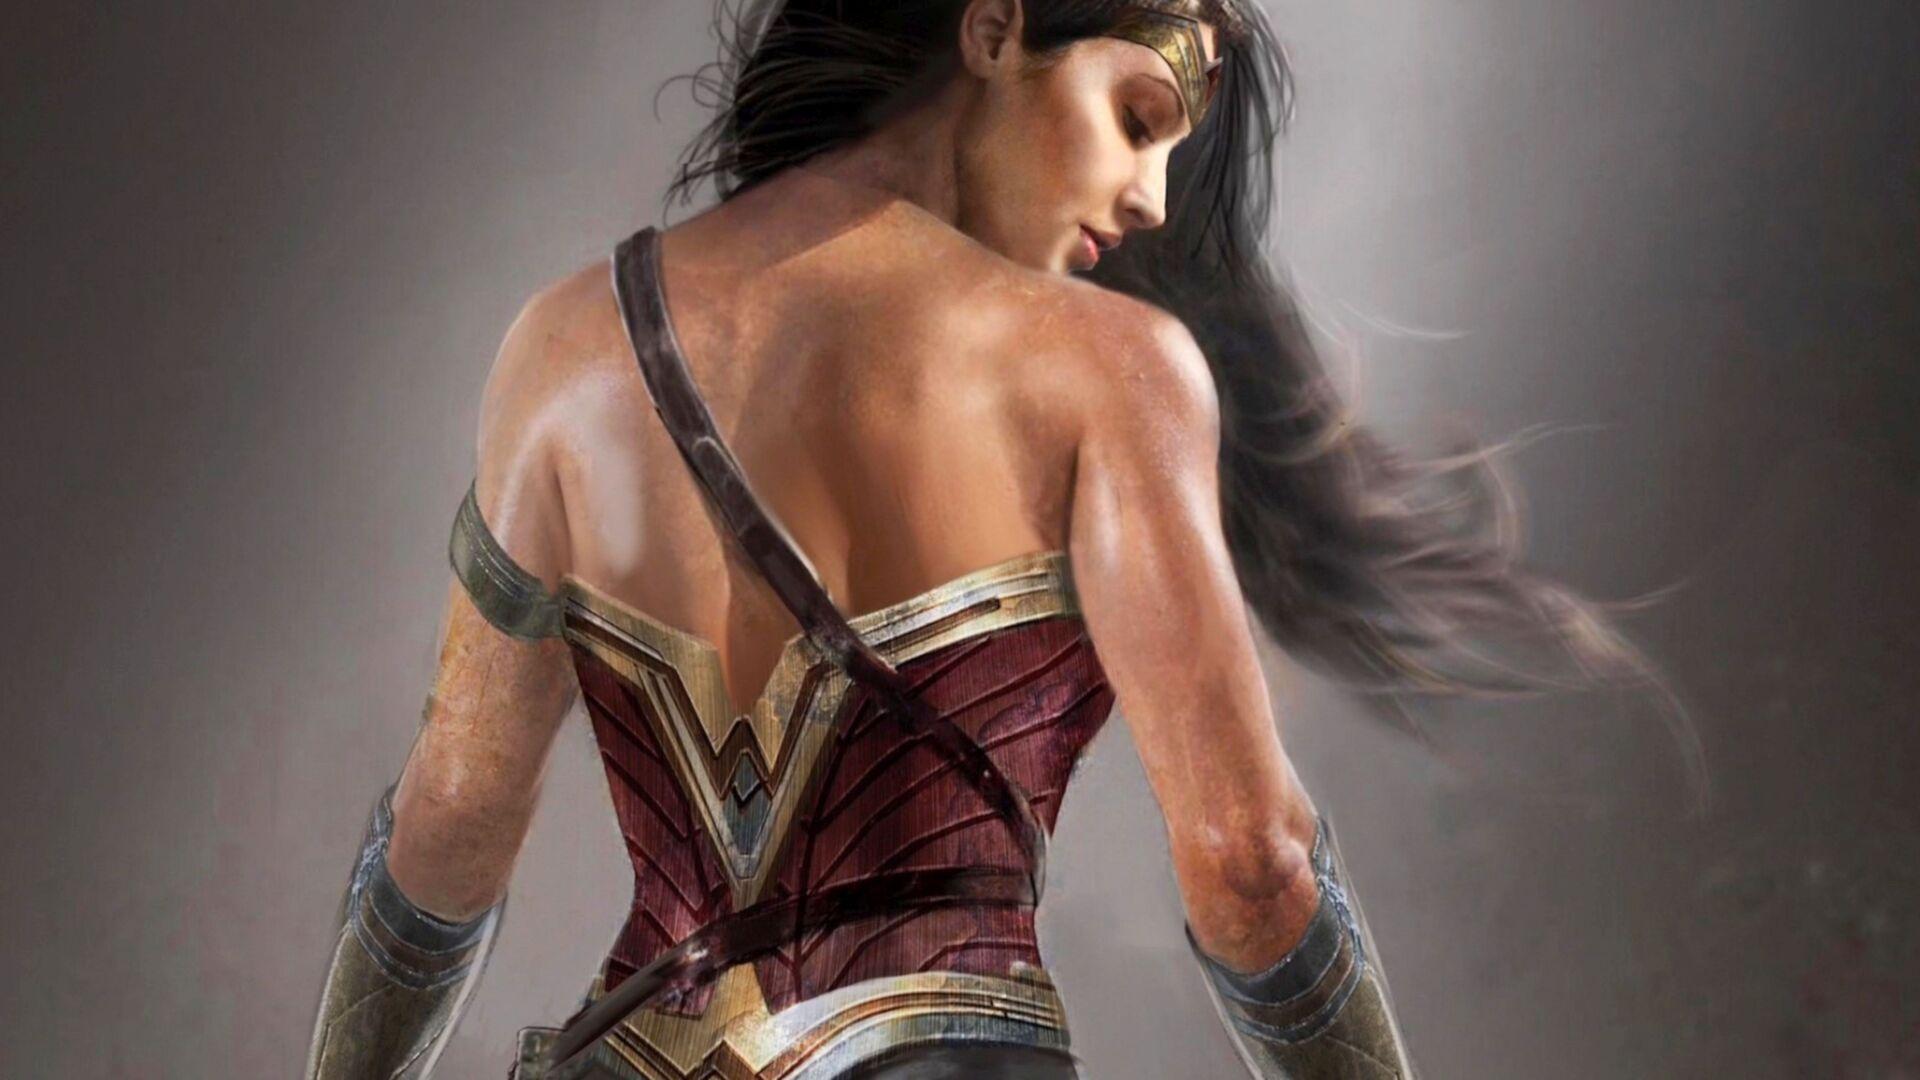 Wonder Woman 4k 8k Movie Wallpapers: 1920x1080 Gal Gadot Wonder Woman Artwork Laptop Full HD